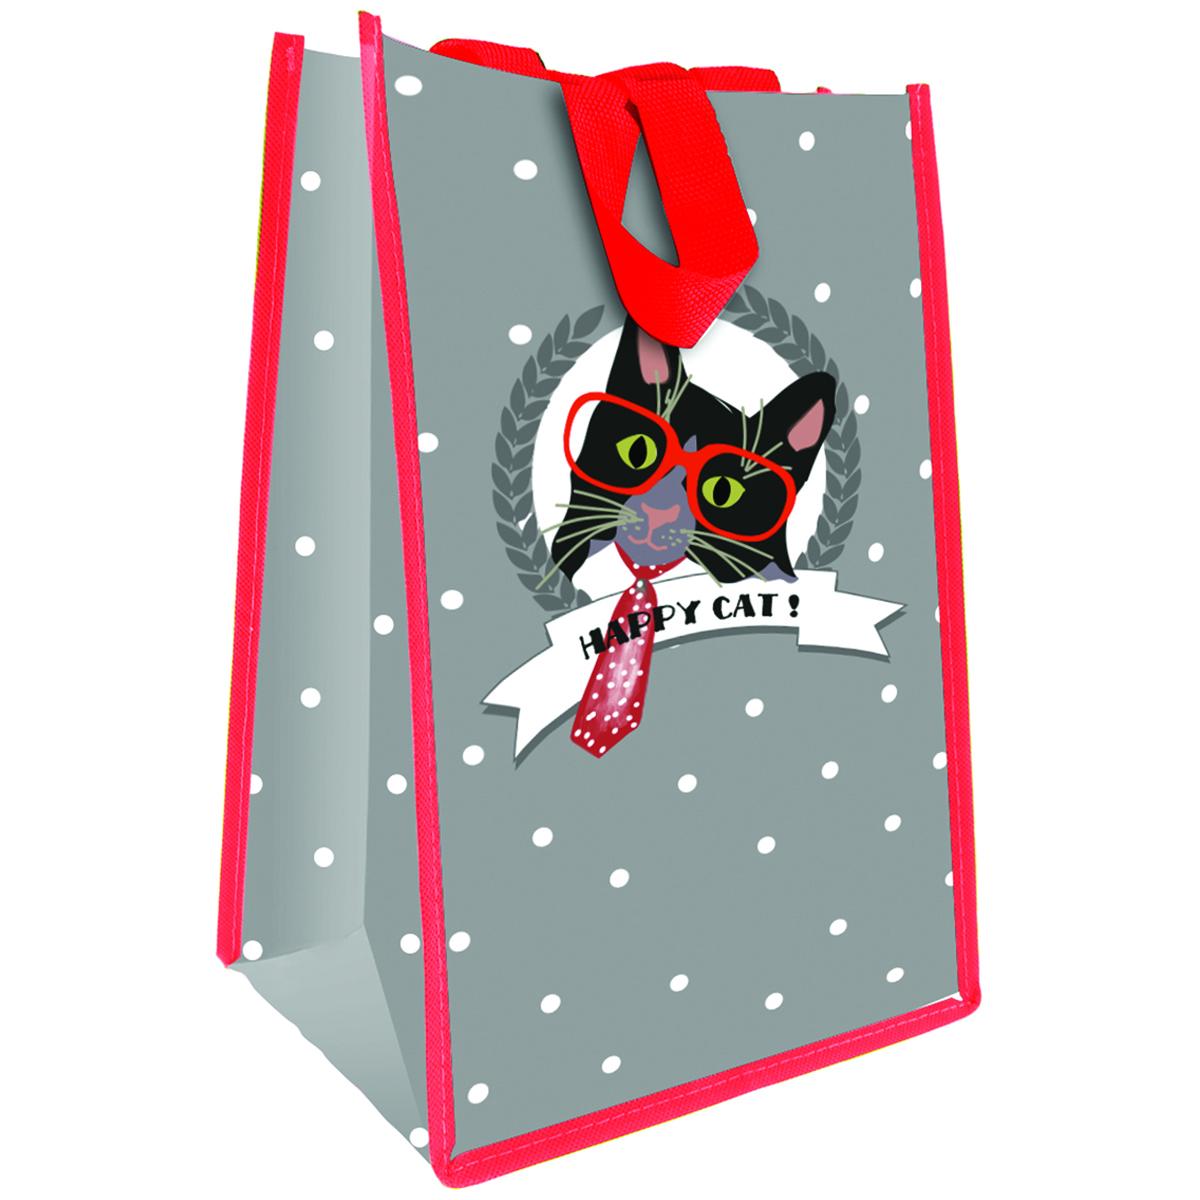 Sac Shopping \'Happy Cat !\' gris rouge - 35x25x19 cm - [Q3383]